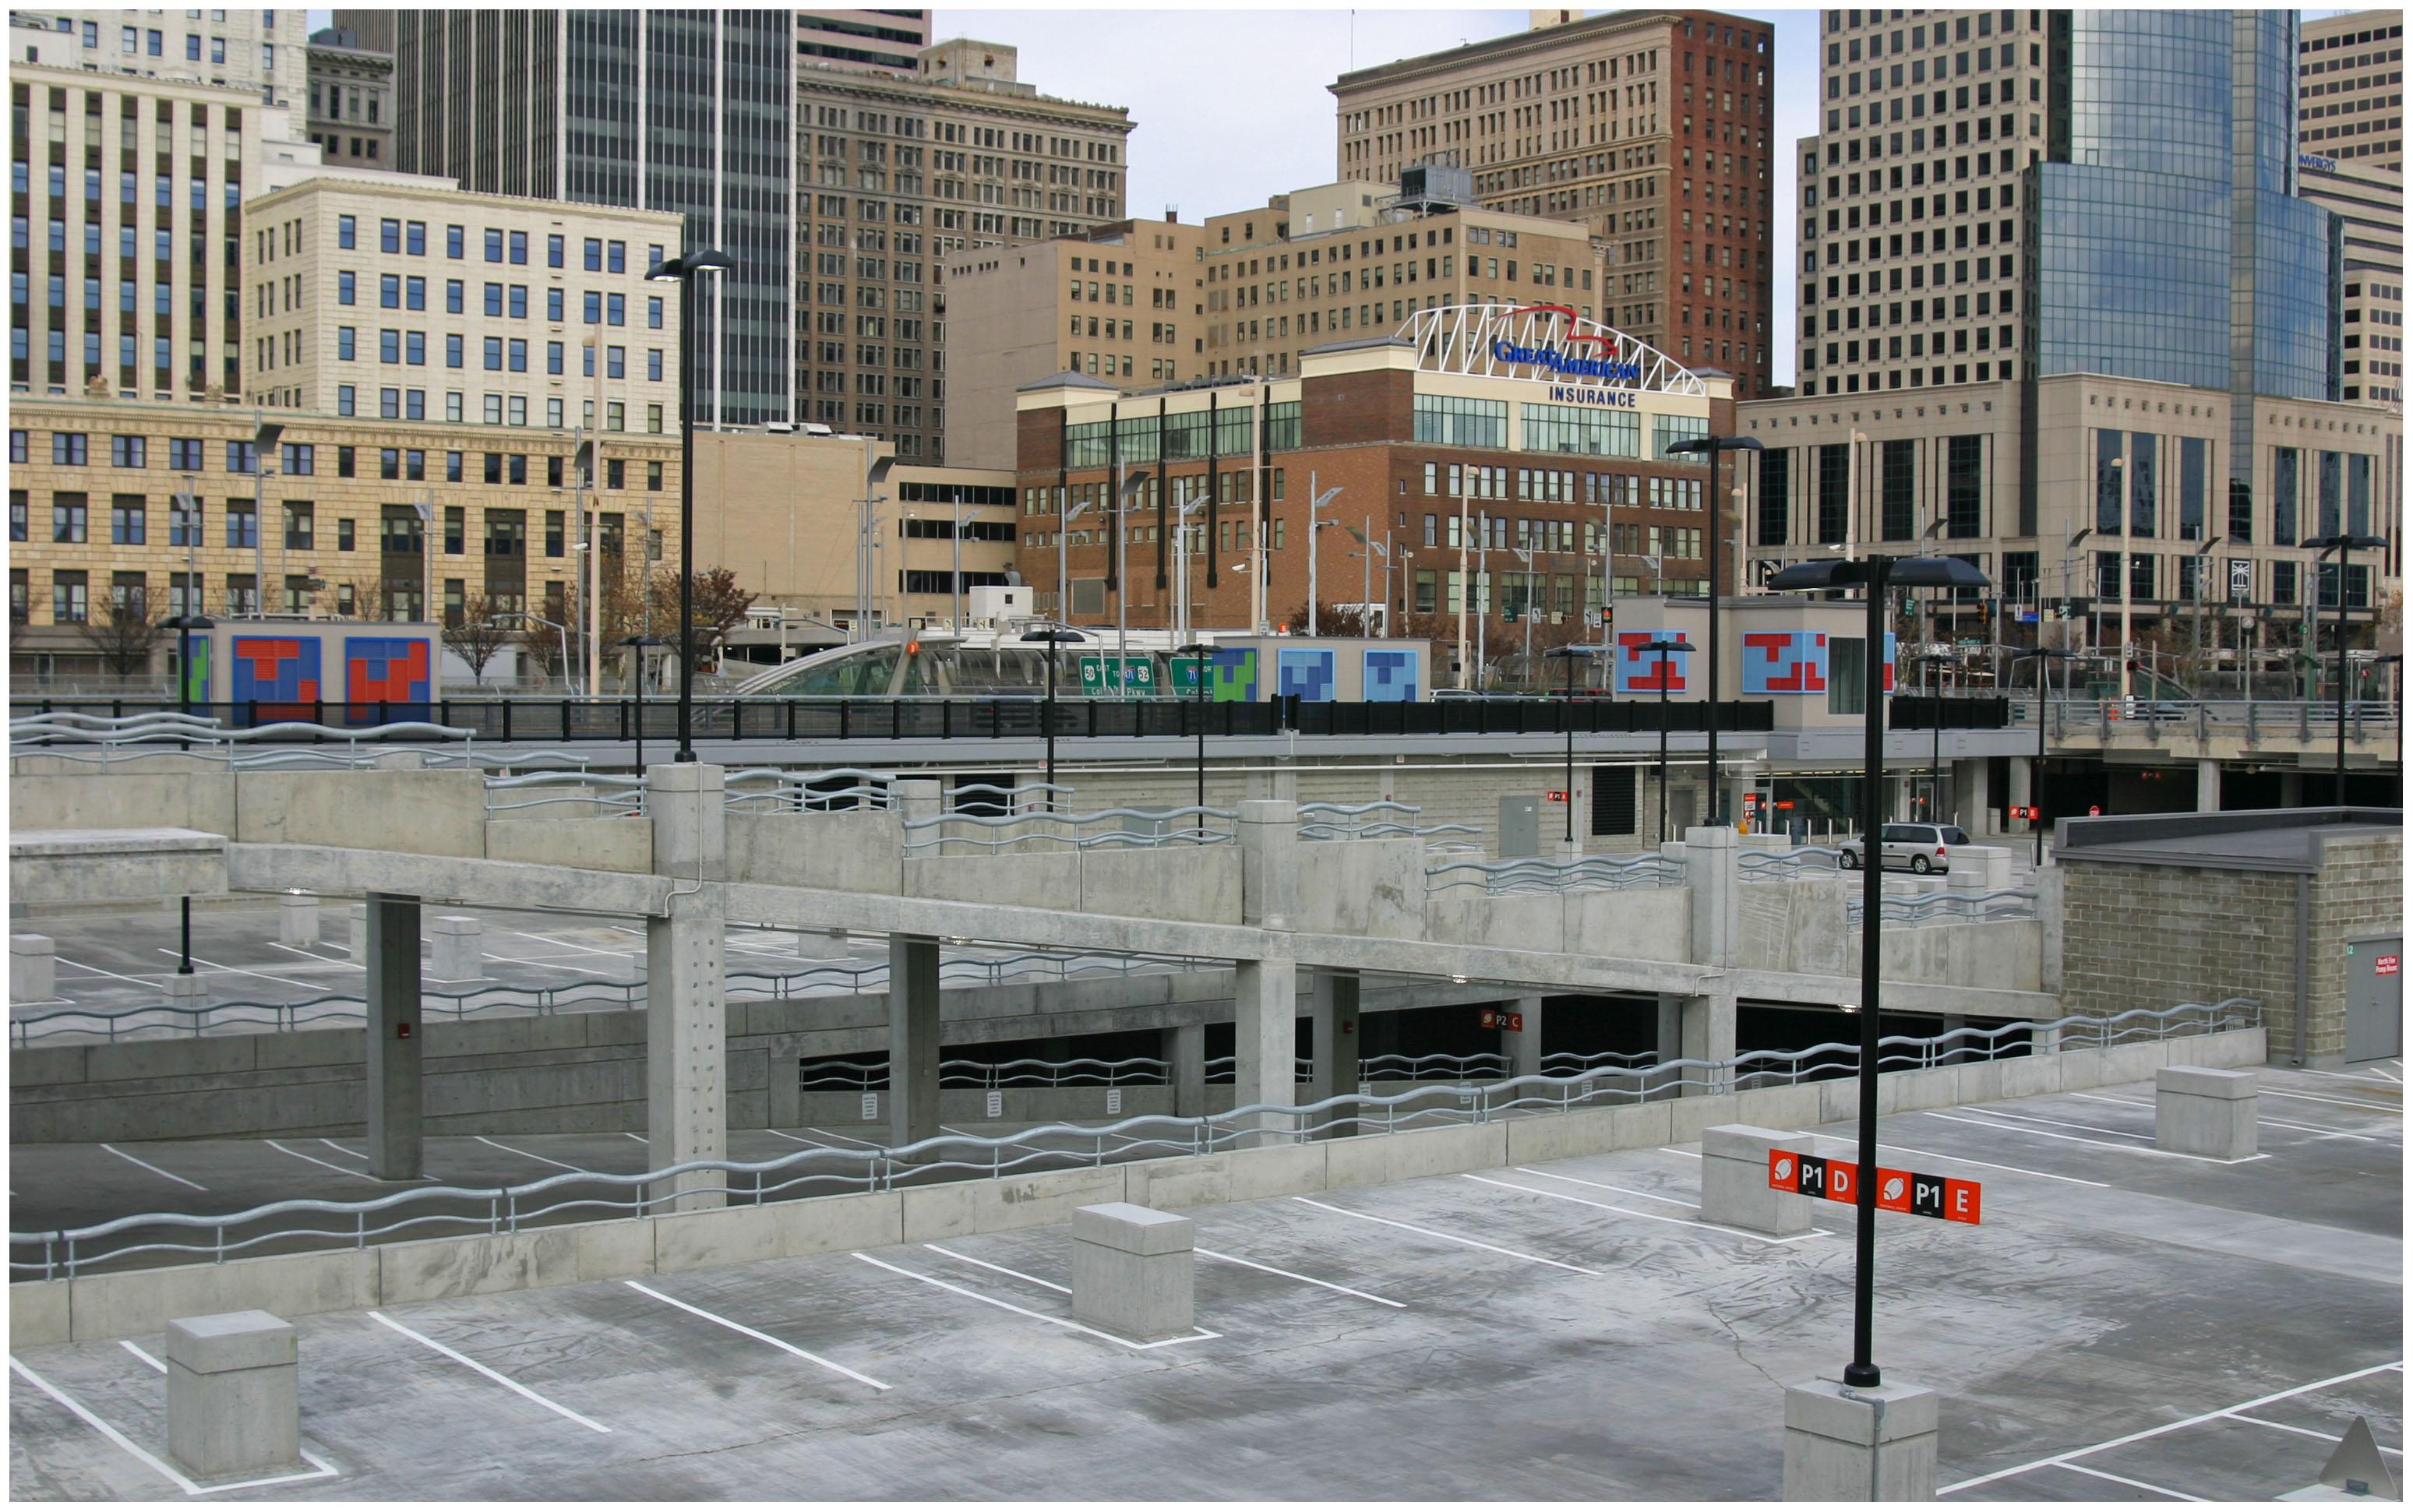 Downtown Cincinnati Parking Urbancincy